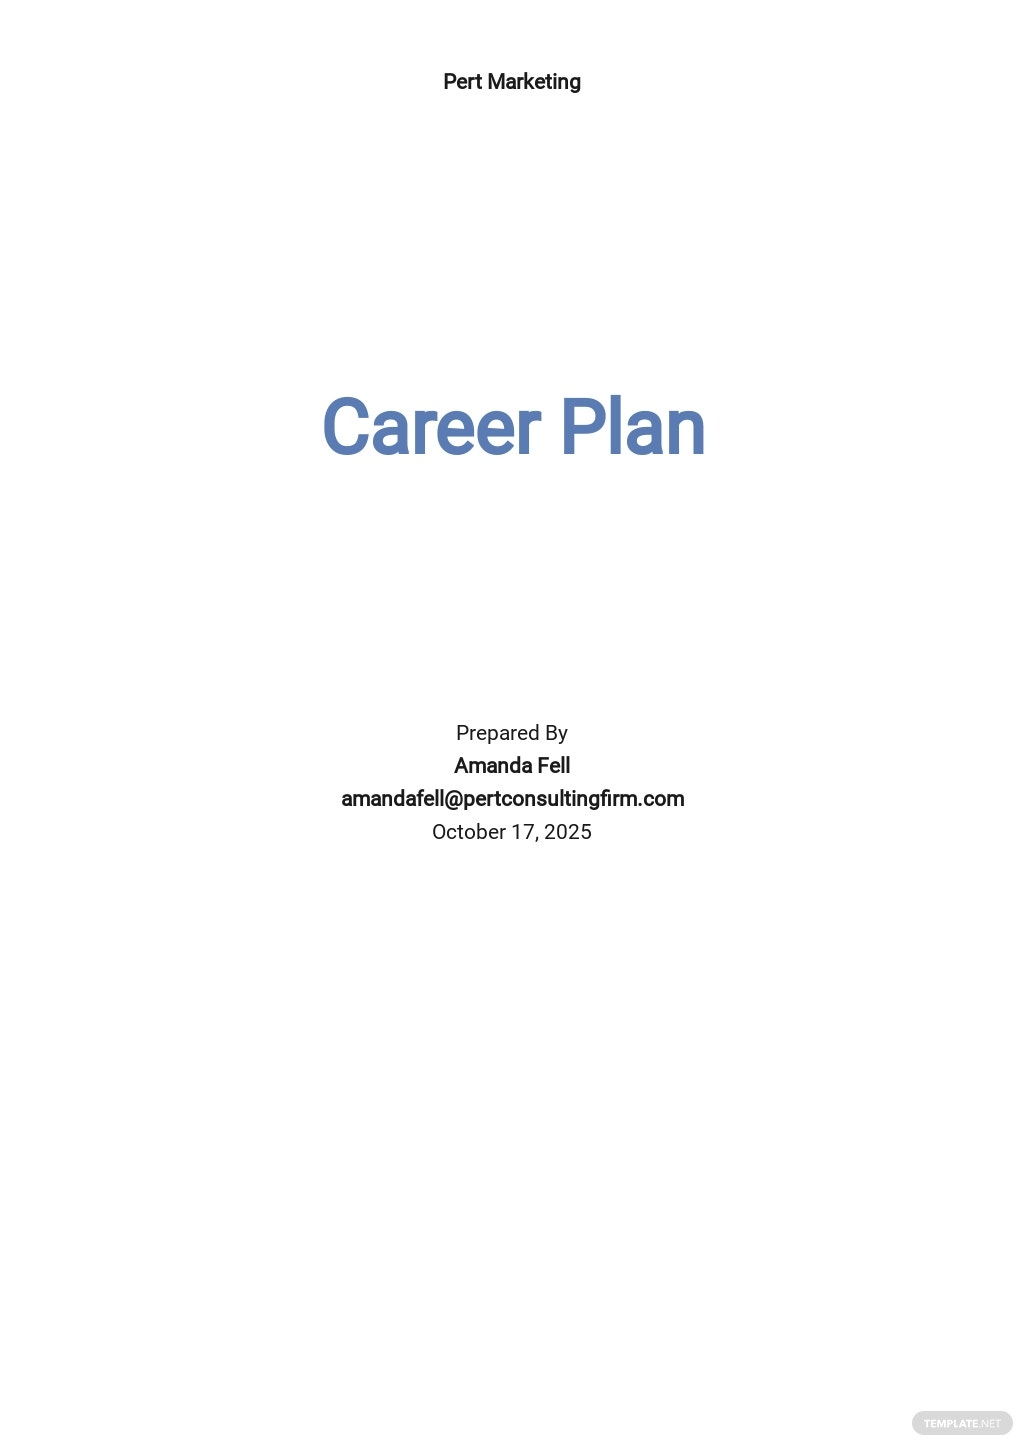 Career Plan Template.jpe